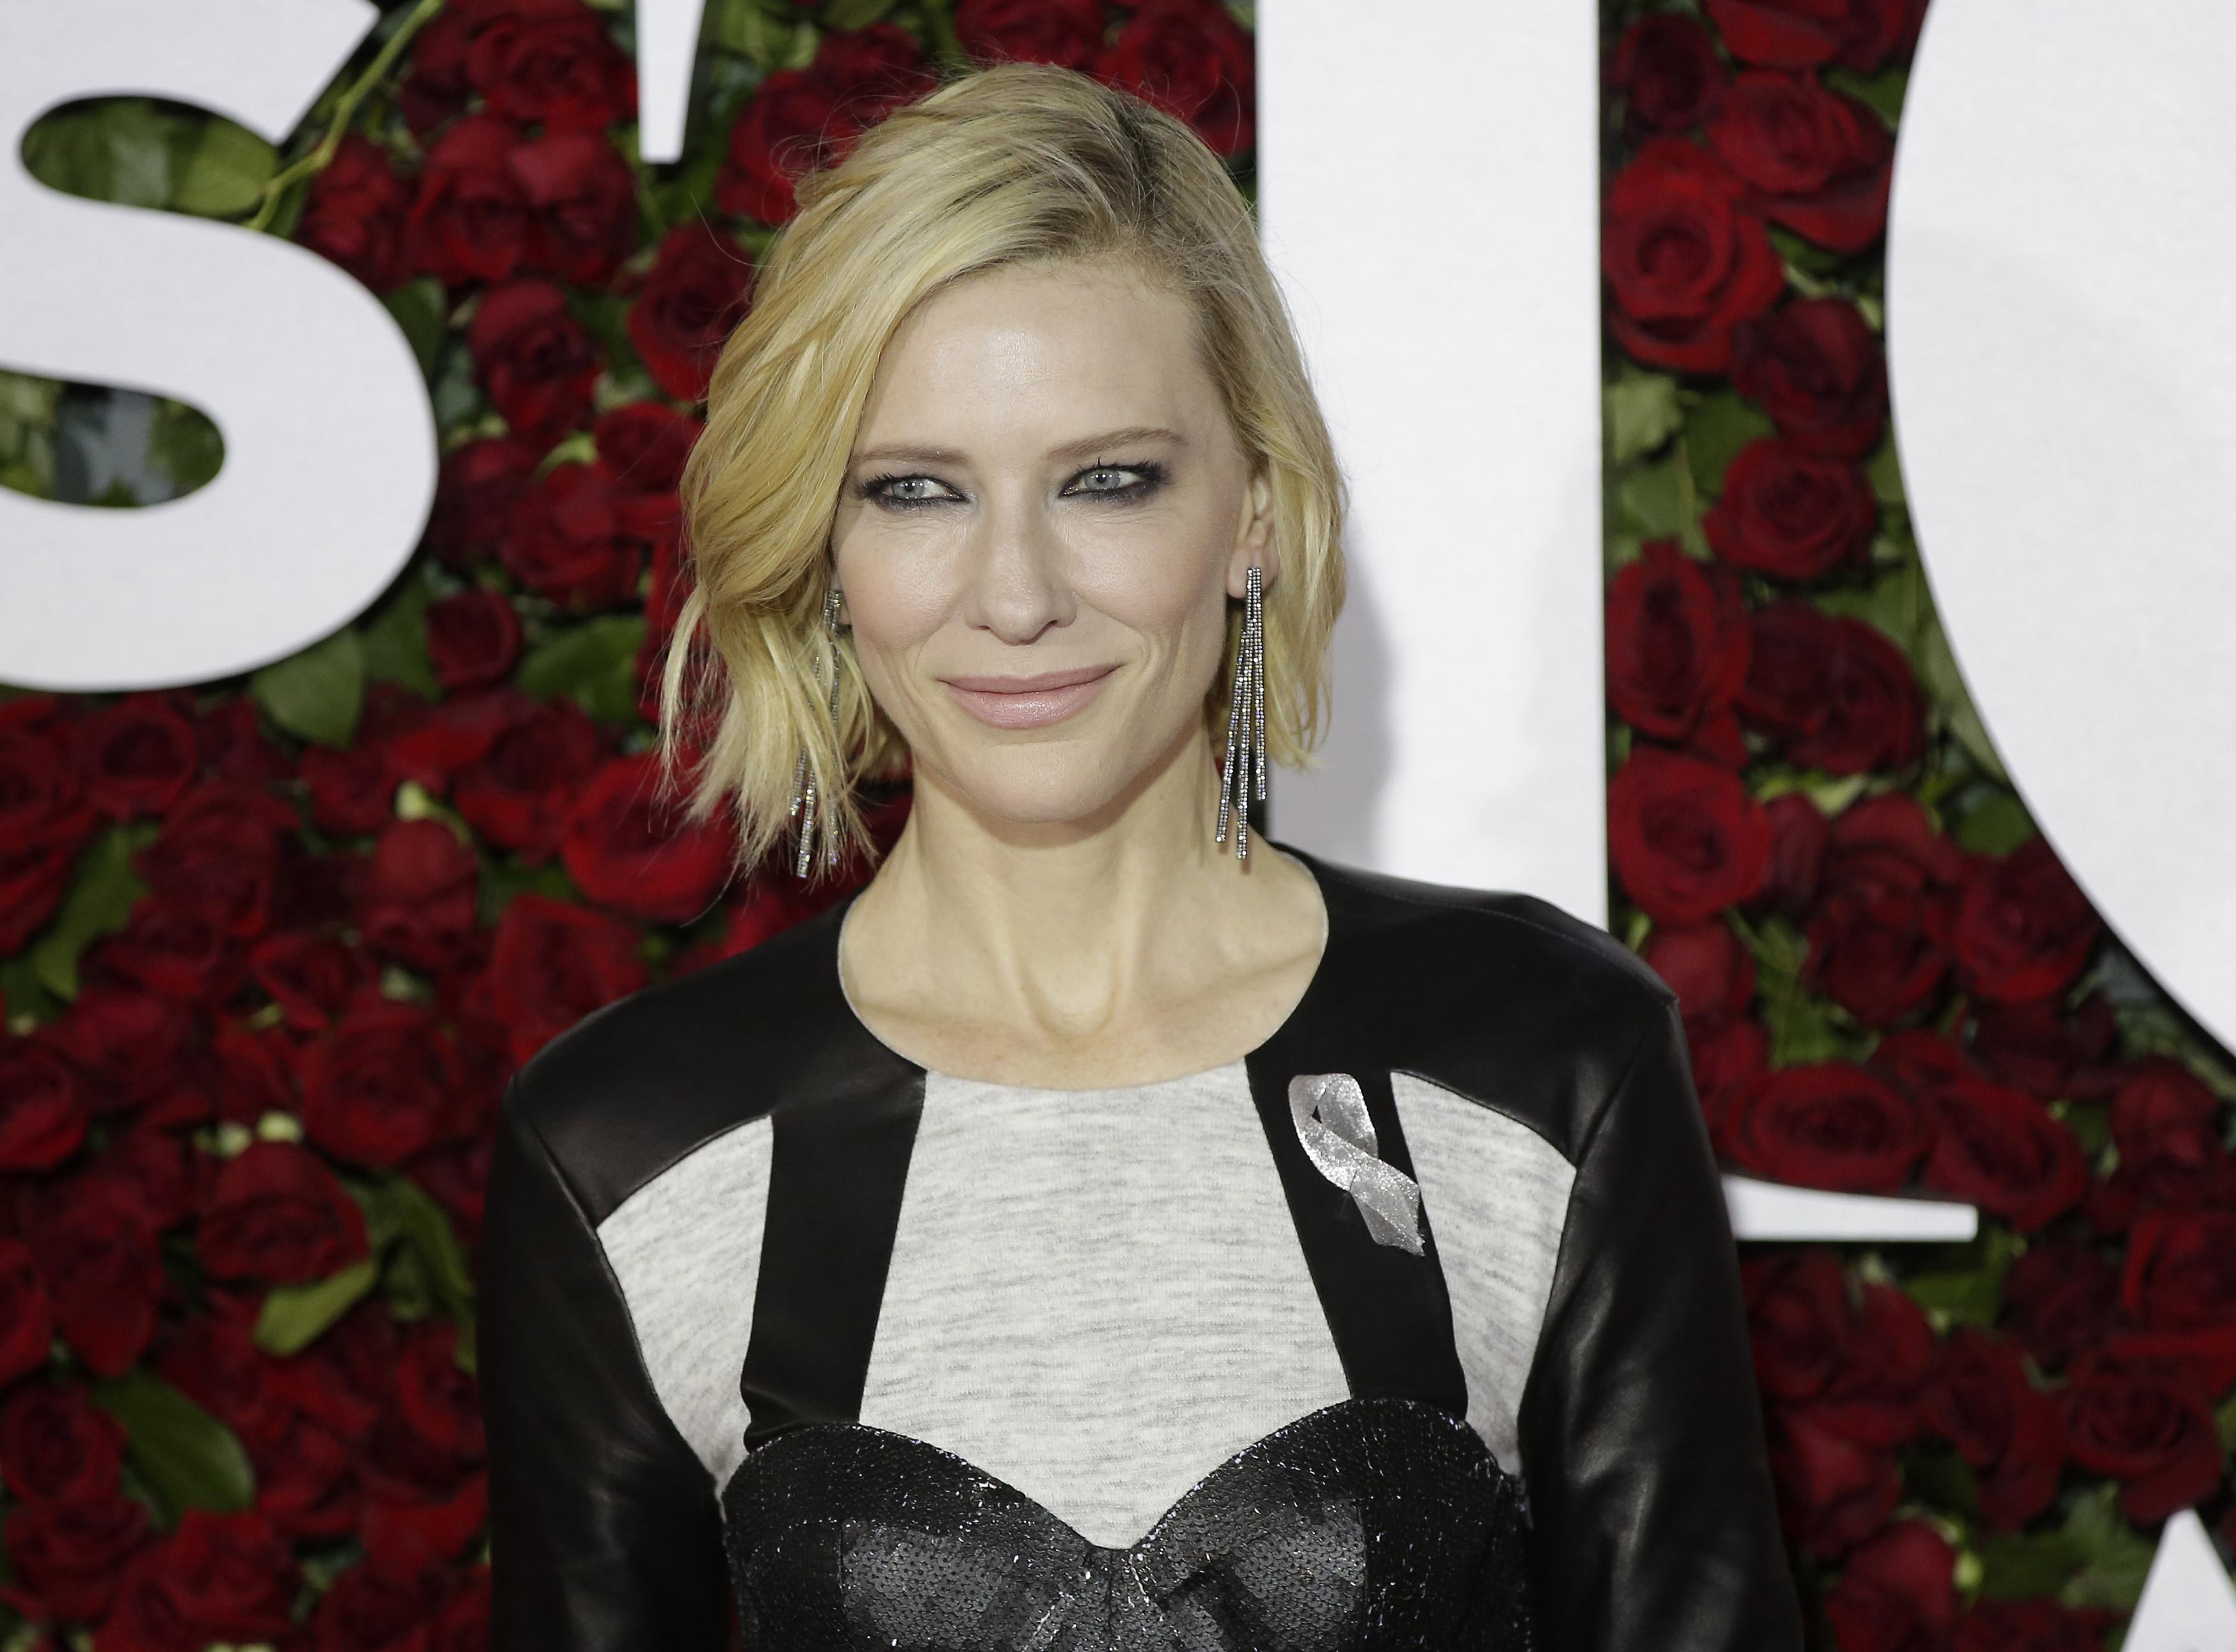 Cate Blanchett pokazała… penisa Donalda Trumpa u Jimmy'ego Fallona?!